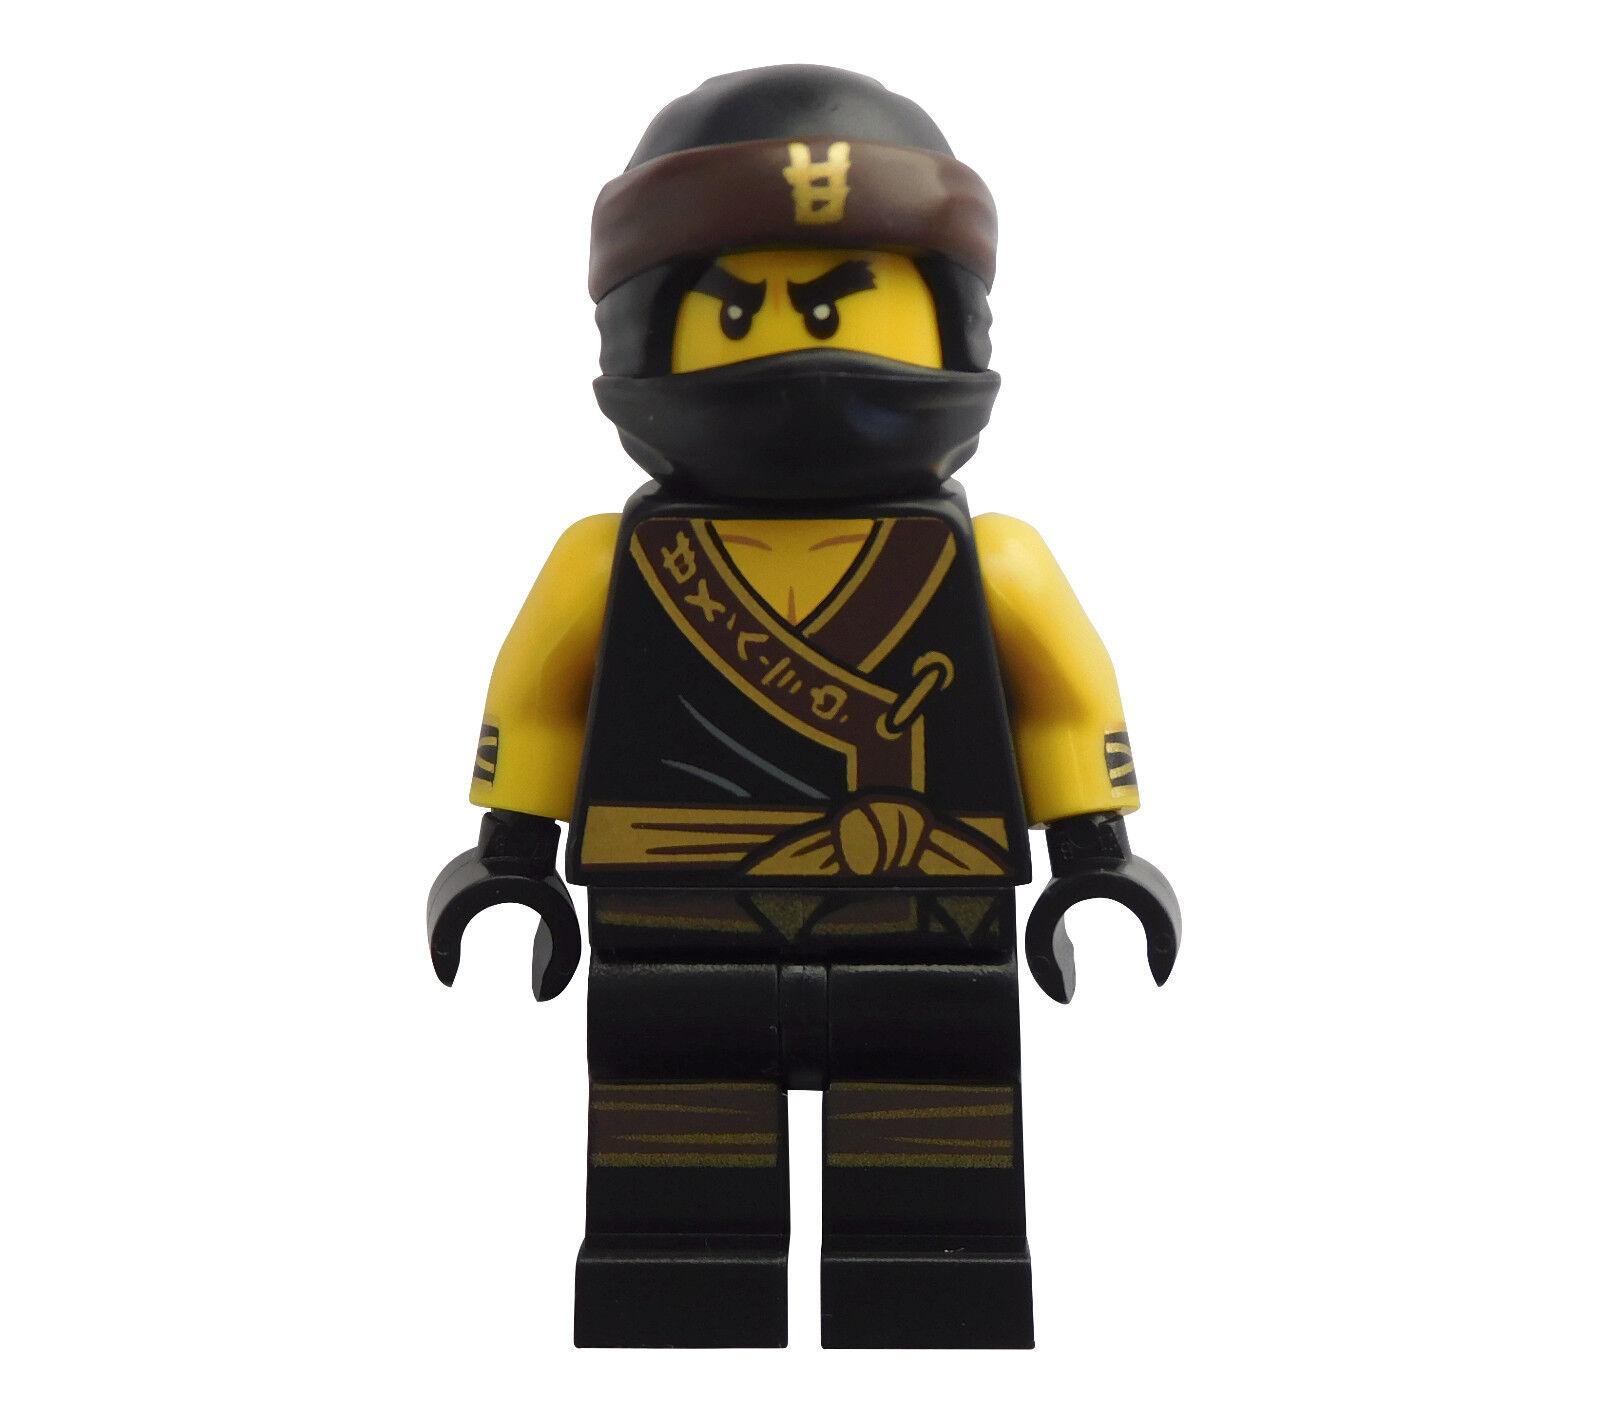 Lego Cole Ninjago Ninja Minifigure Lego Figure Figurine ...